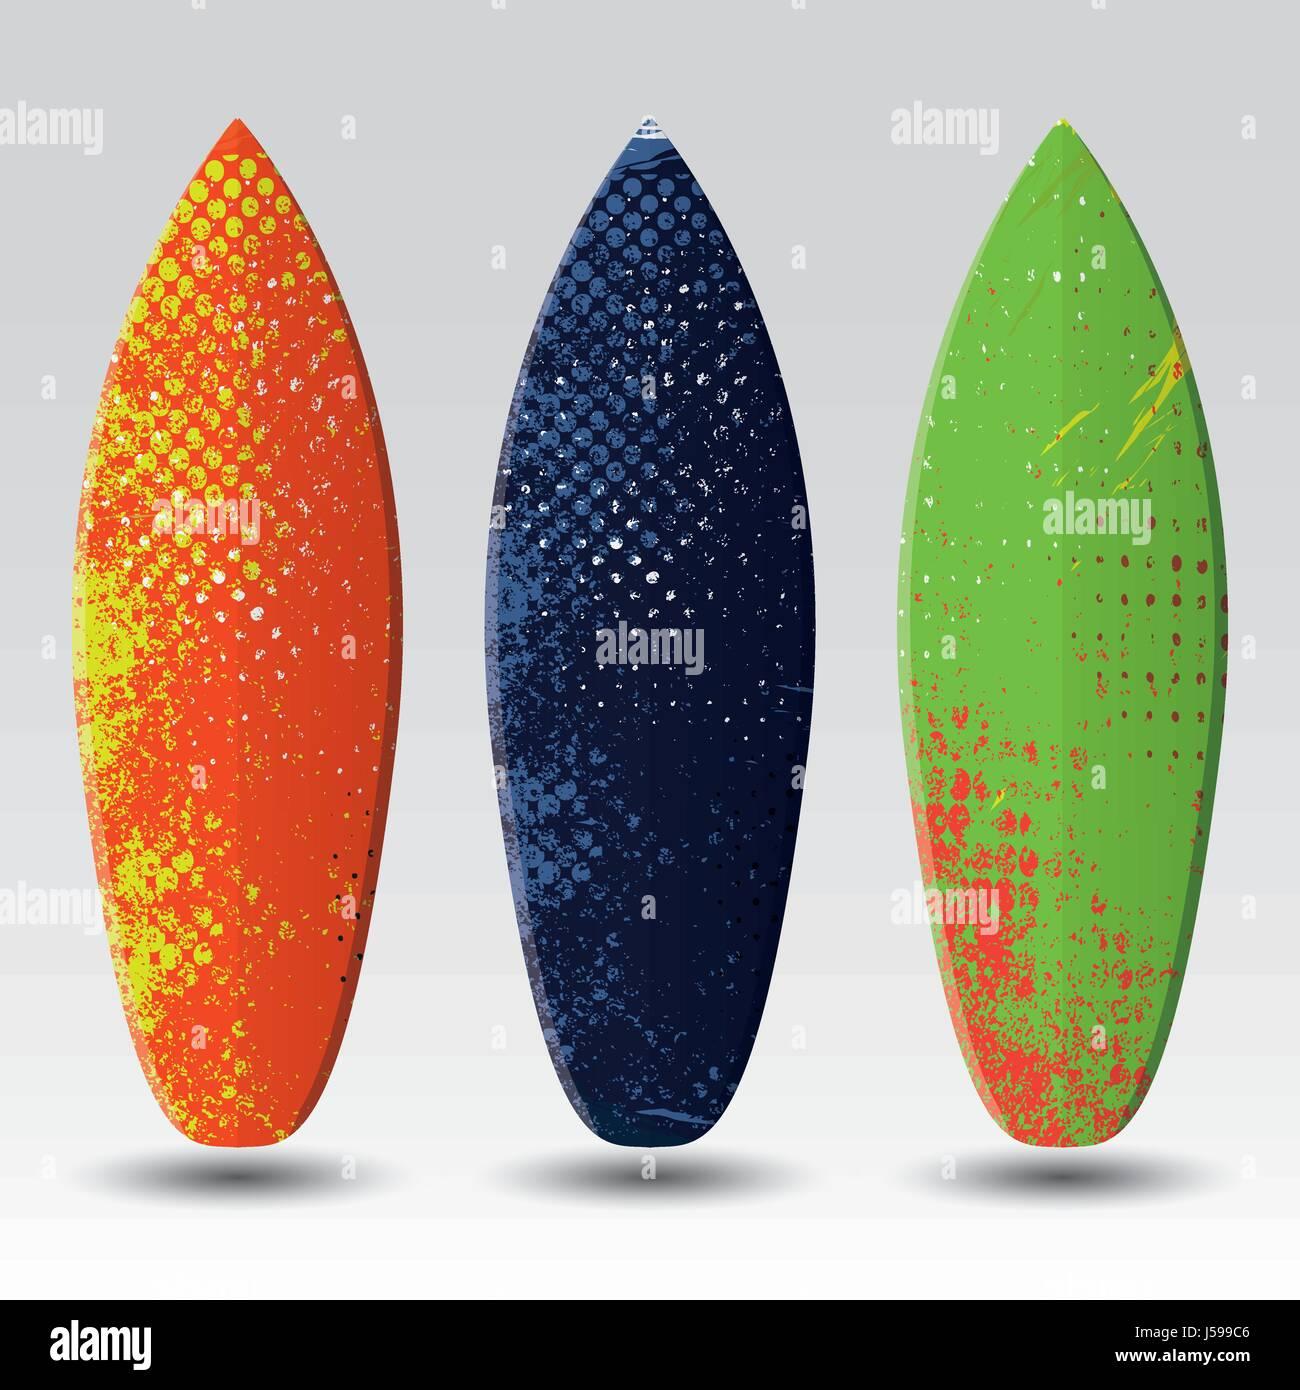 Vector Surfboard Design Templates Stock Vector Art Illustration